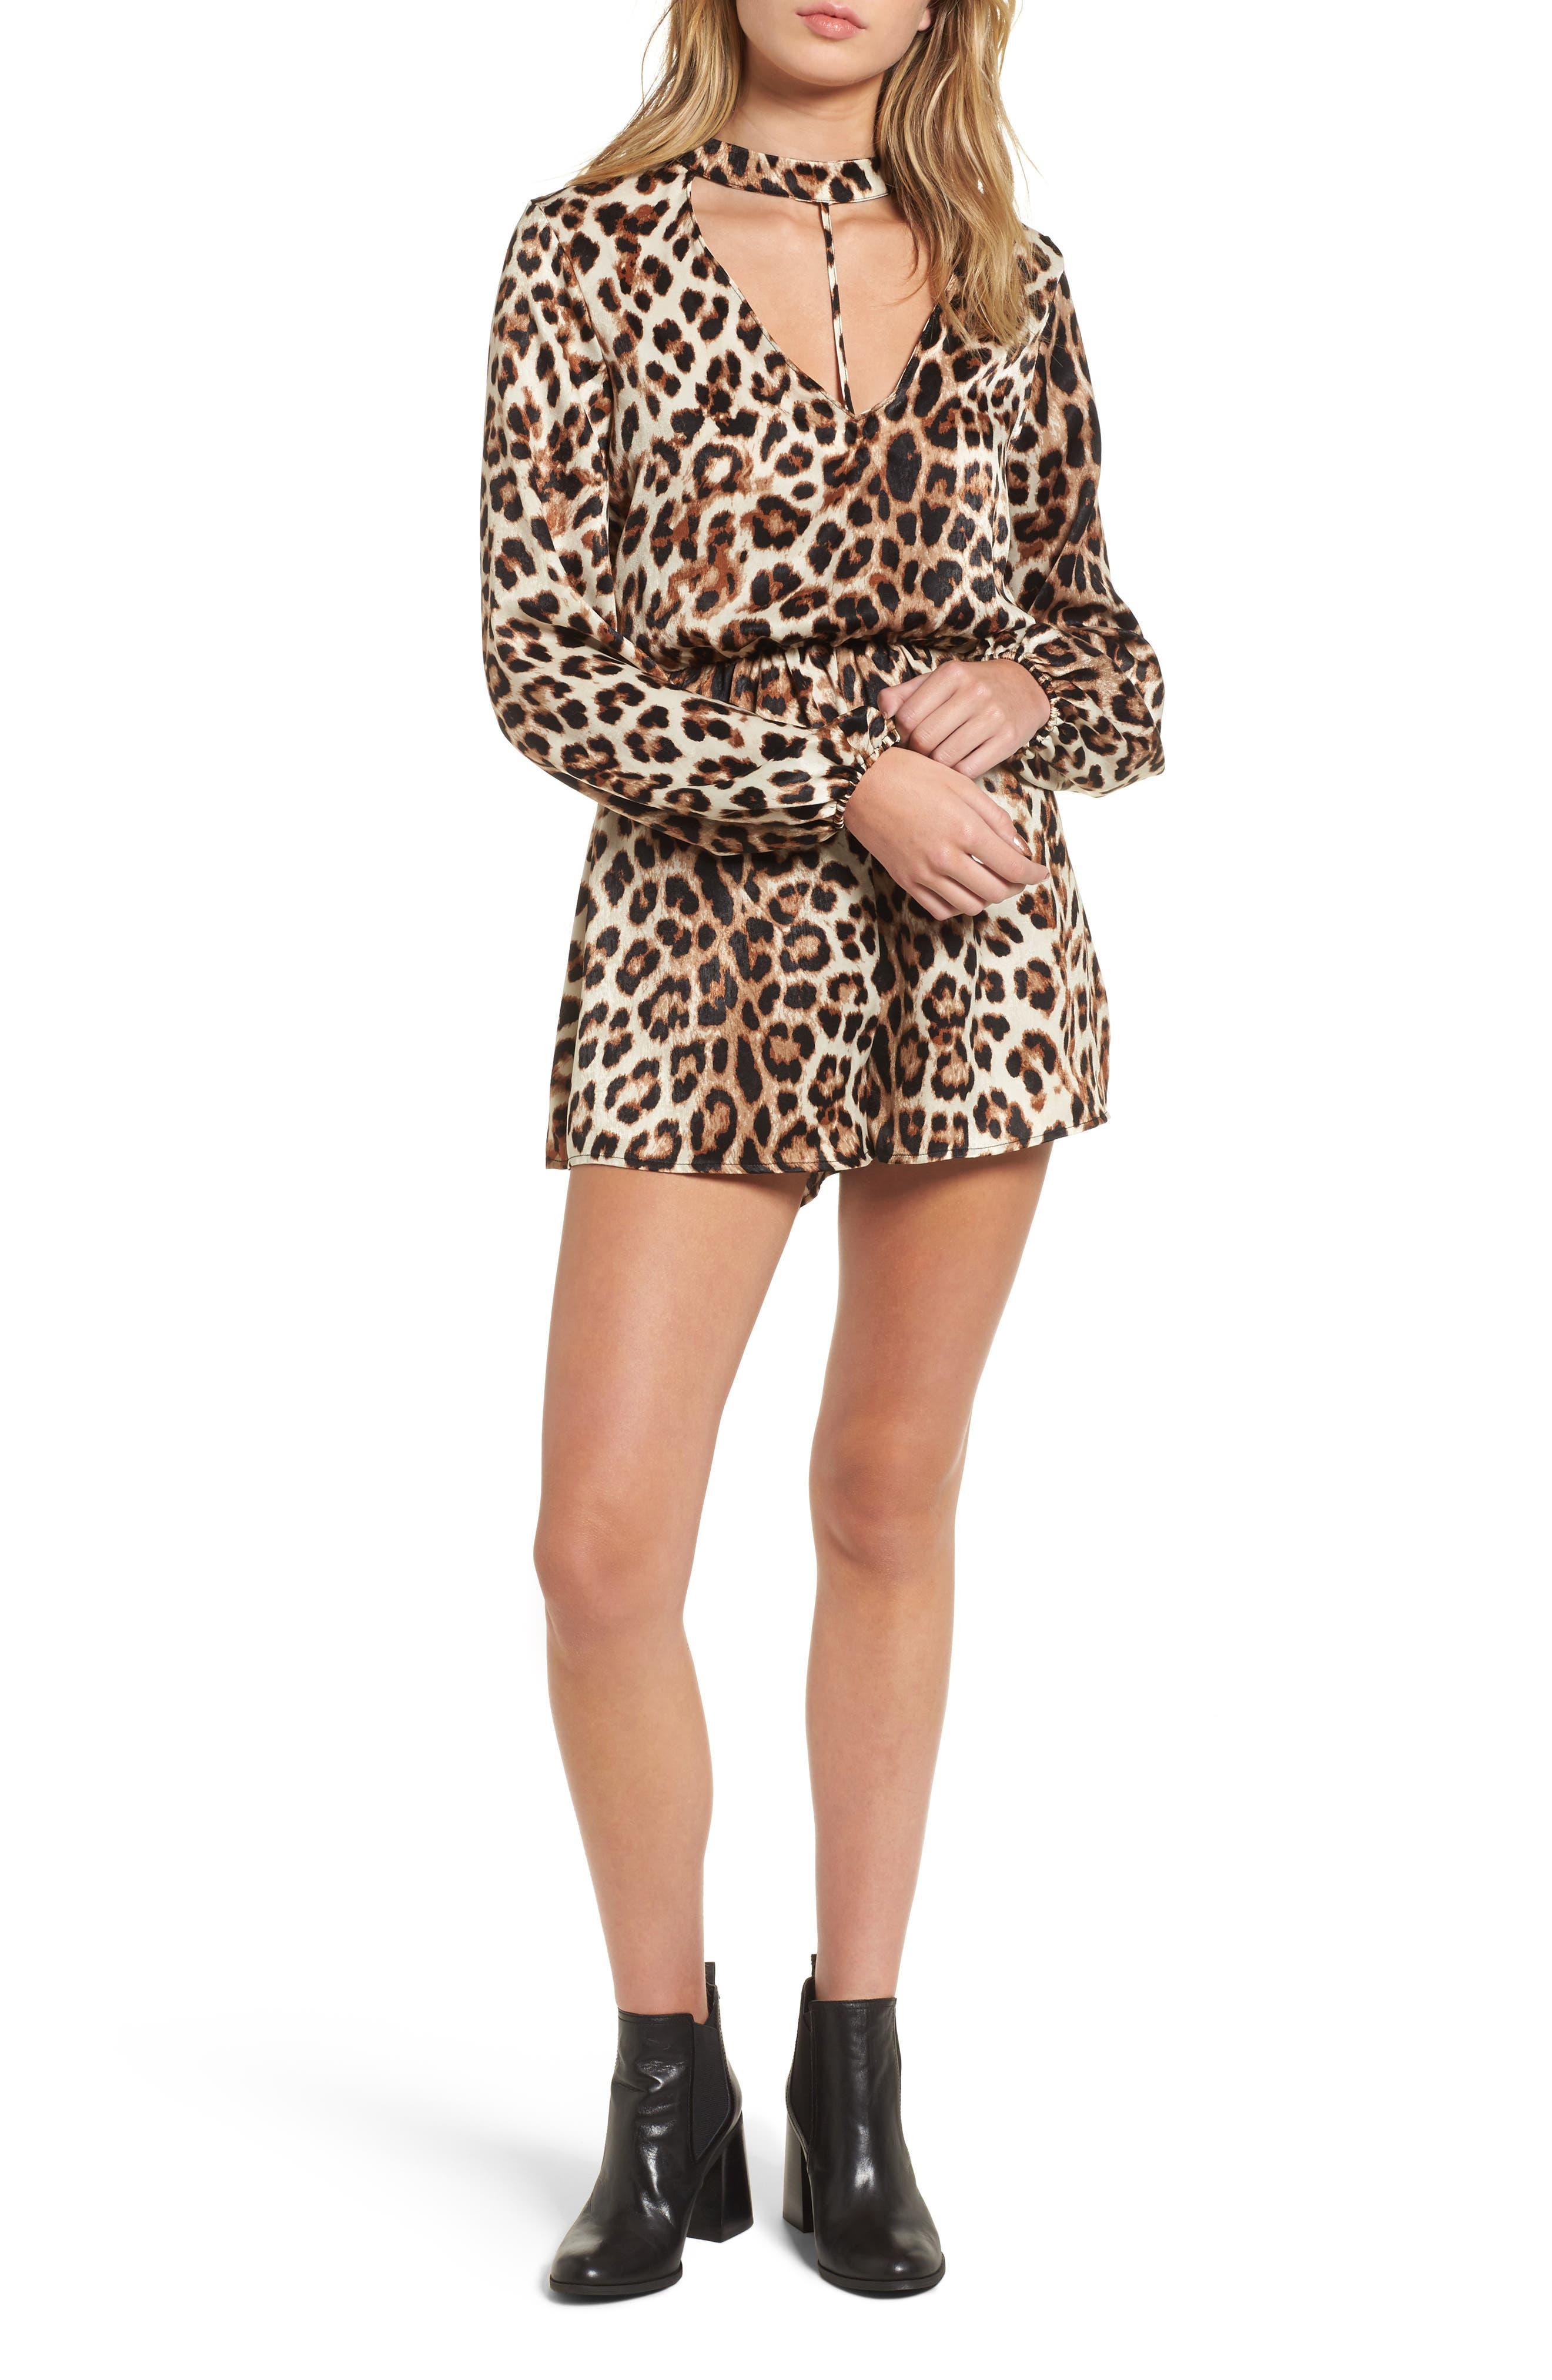 Main Image - Leopard Print Choker Neck Romper